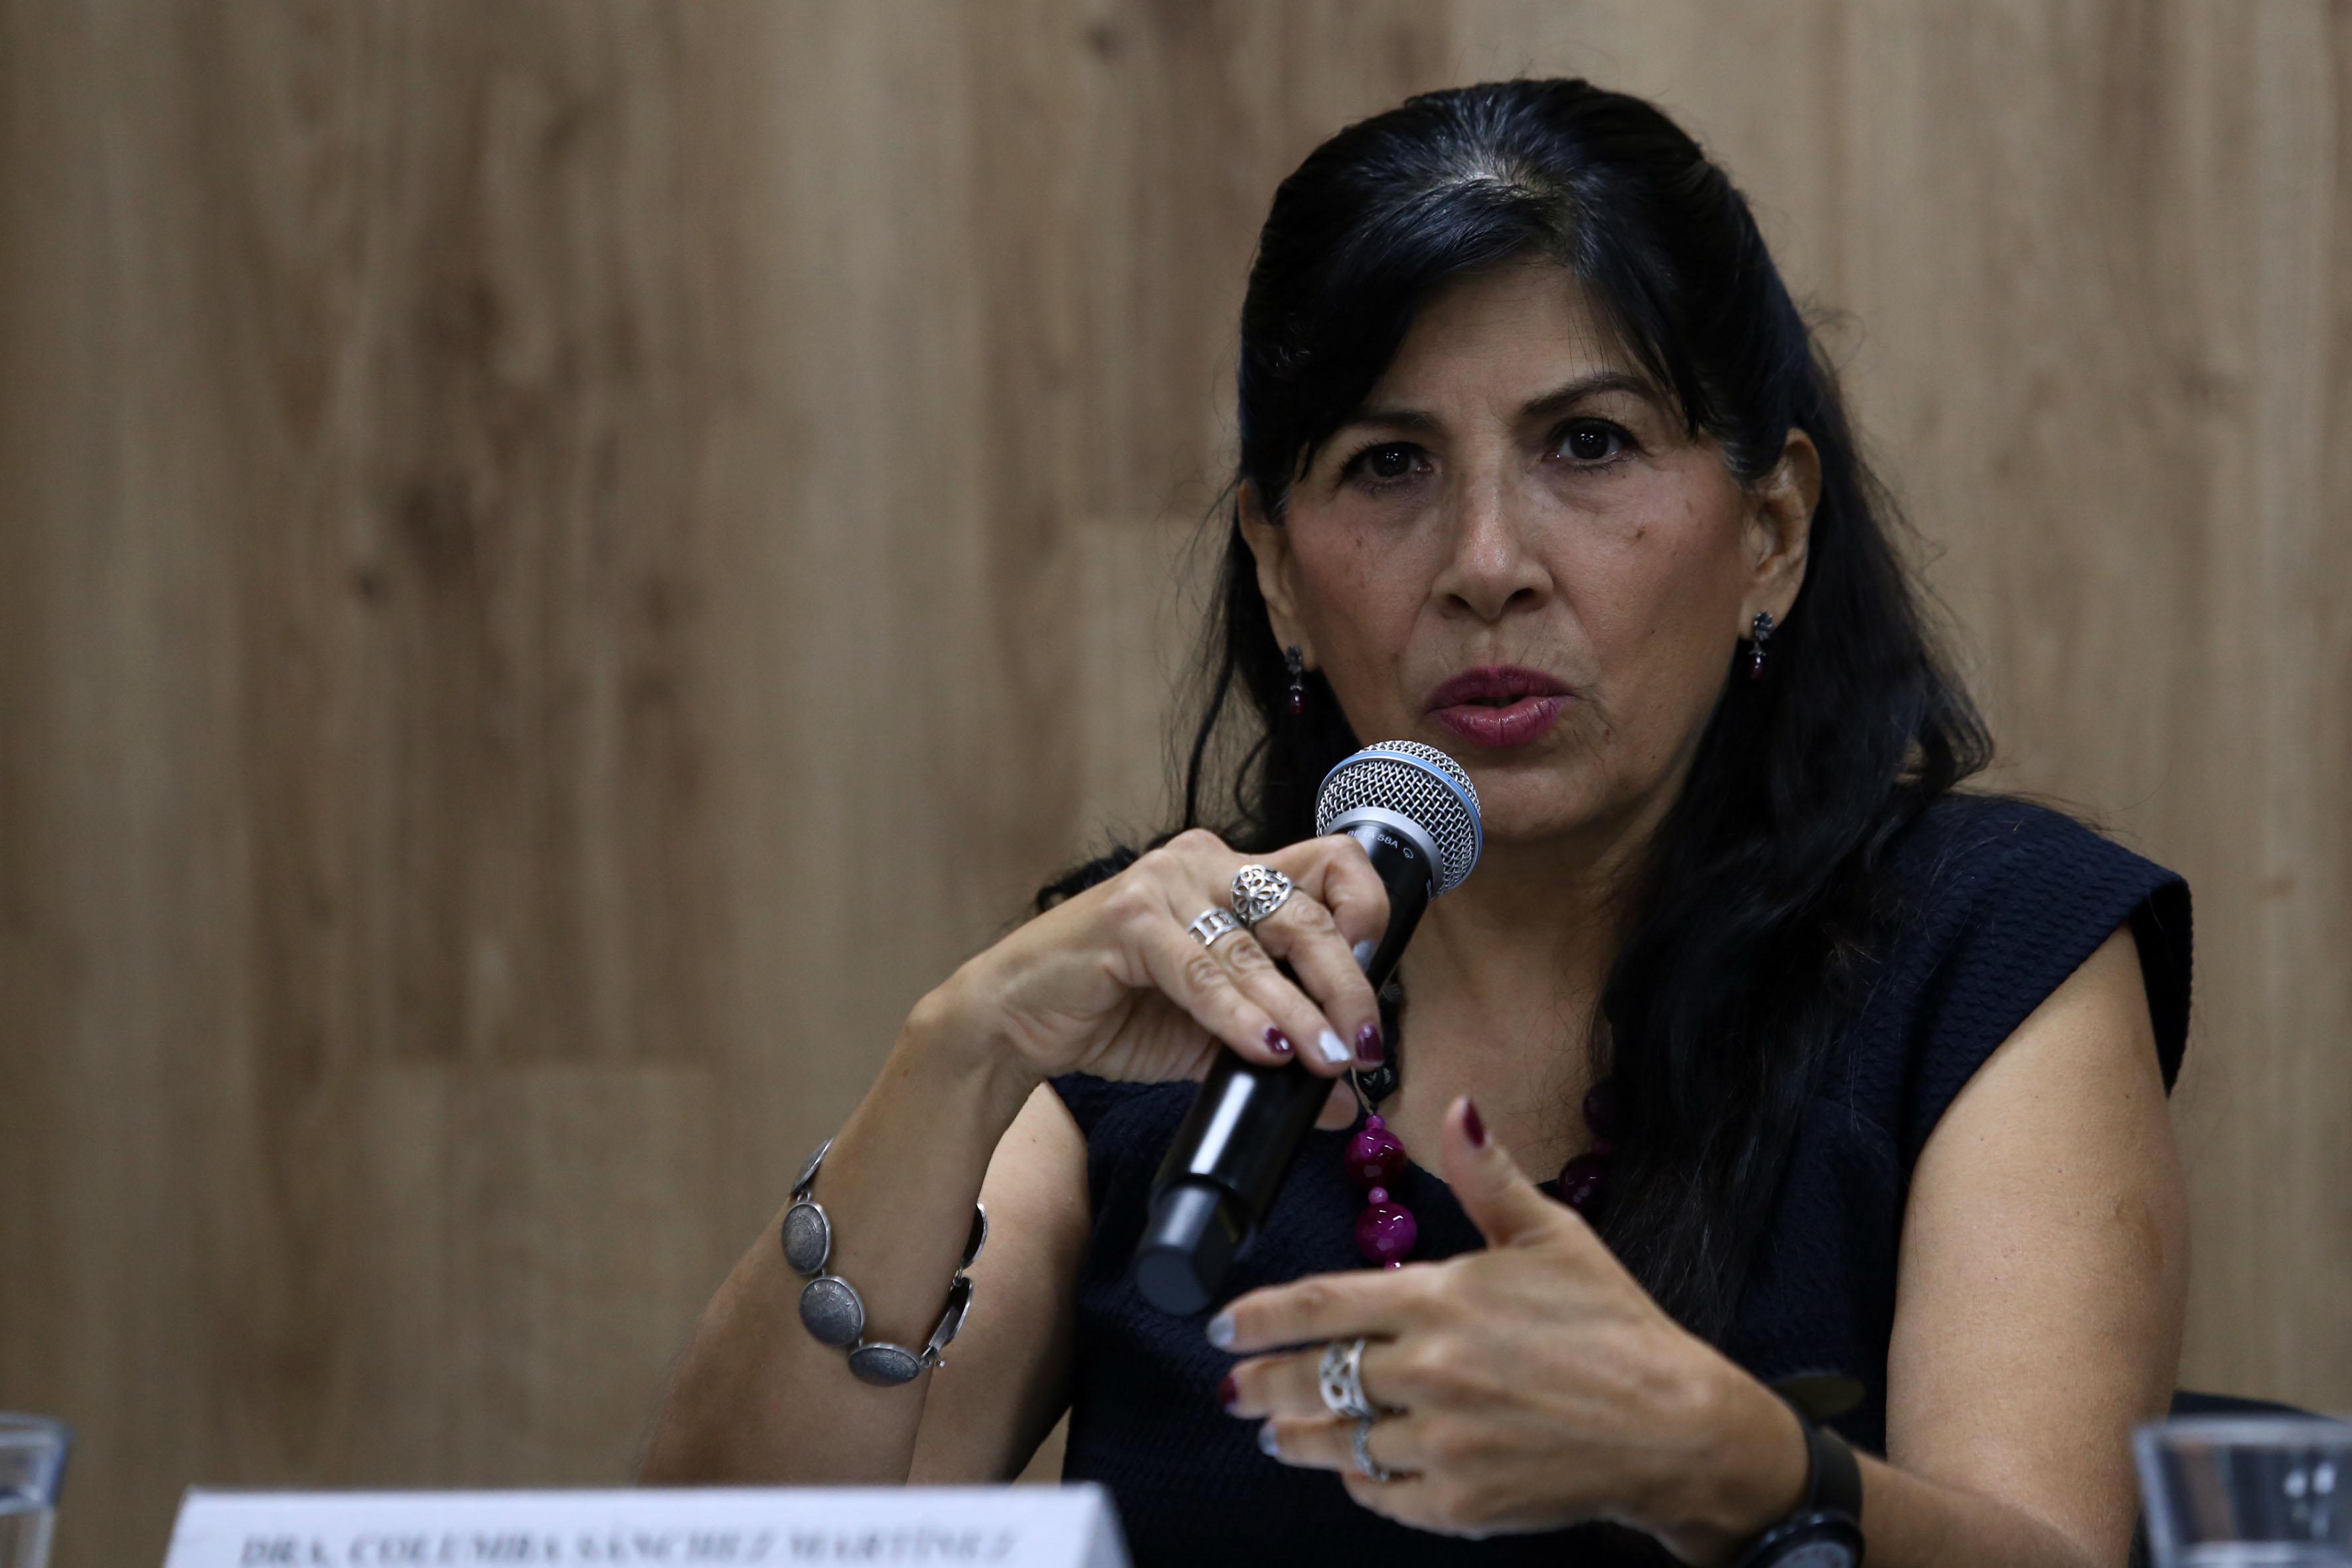 Dra. Columba Sánchez al micrófono